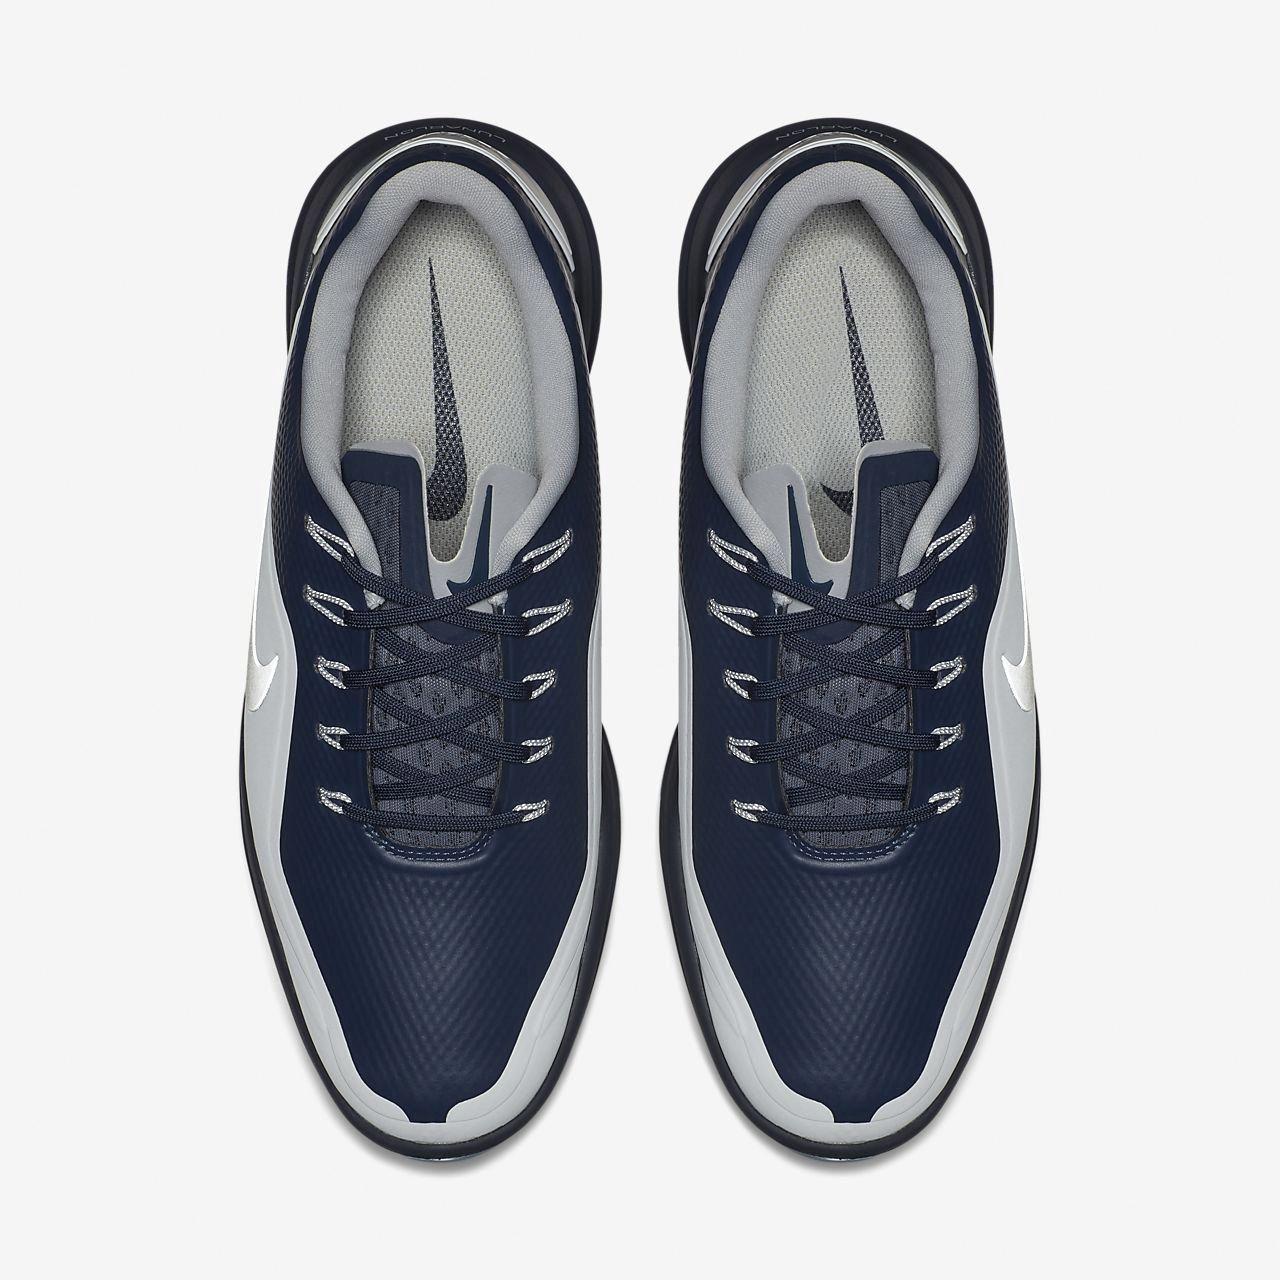 3f33337ada4a Nike Lunar Control Vapor 2 Men s Golf Shoe - 9 Silver  mensgolfshoes ...